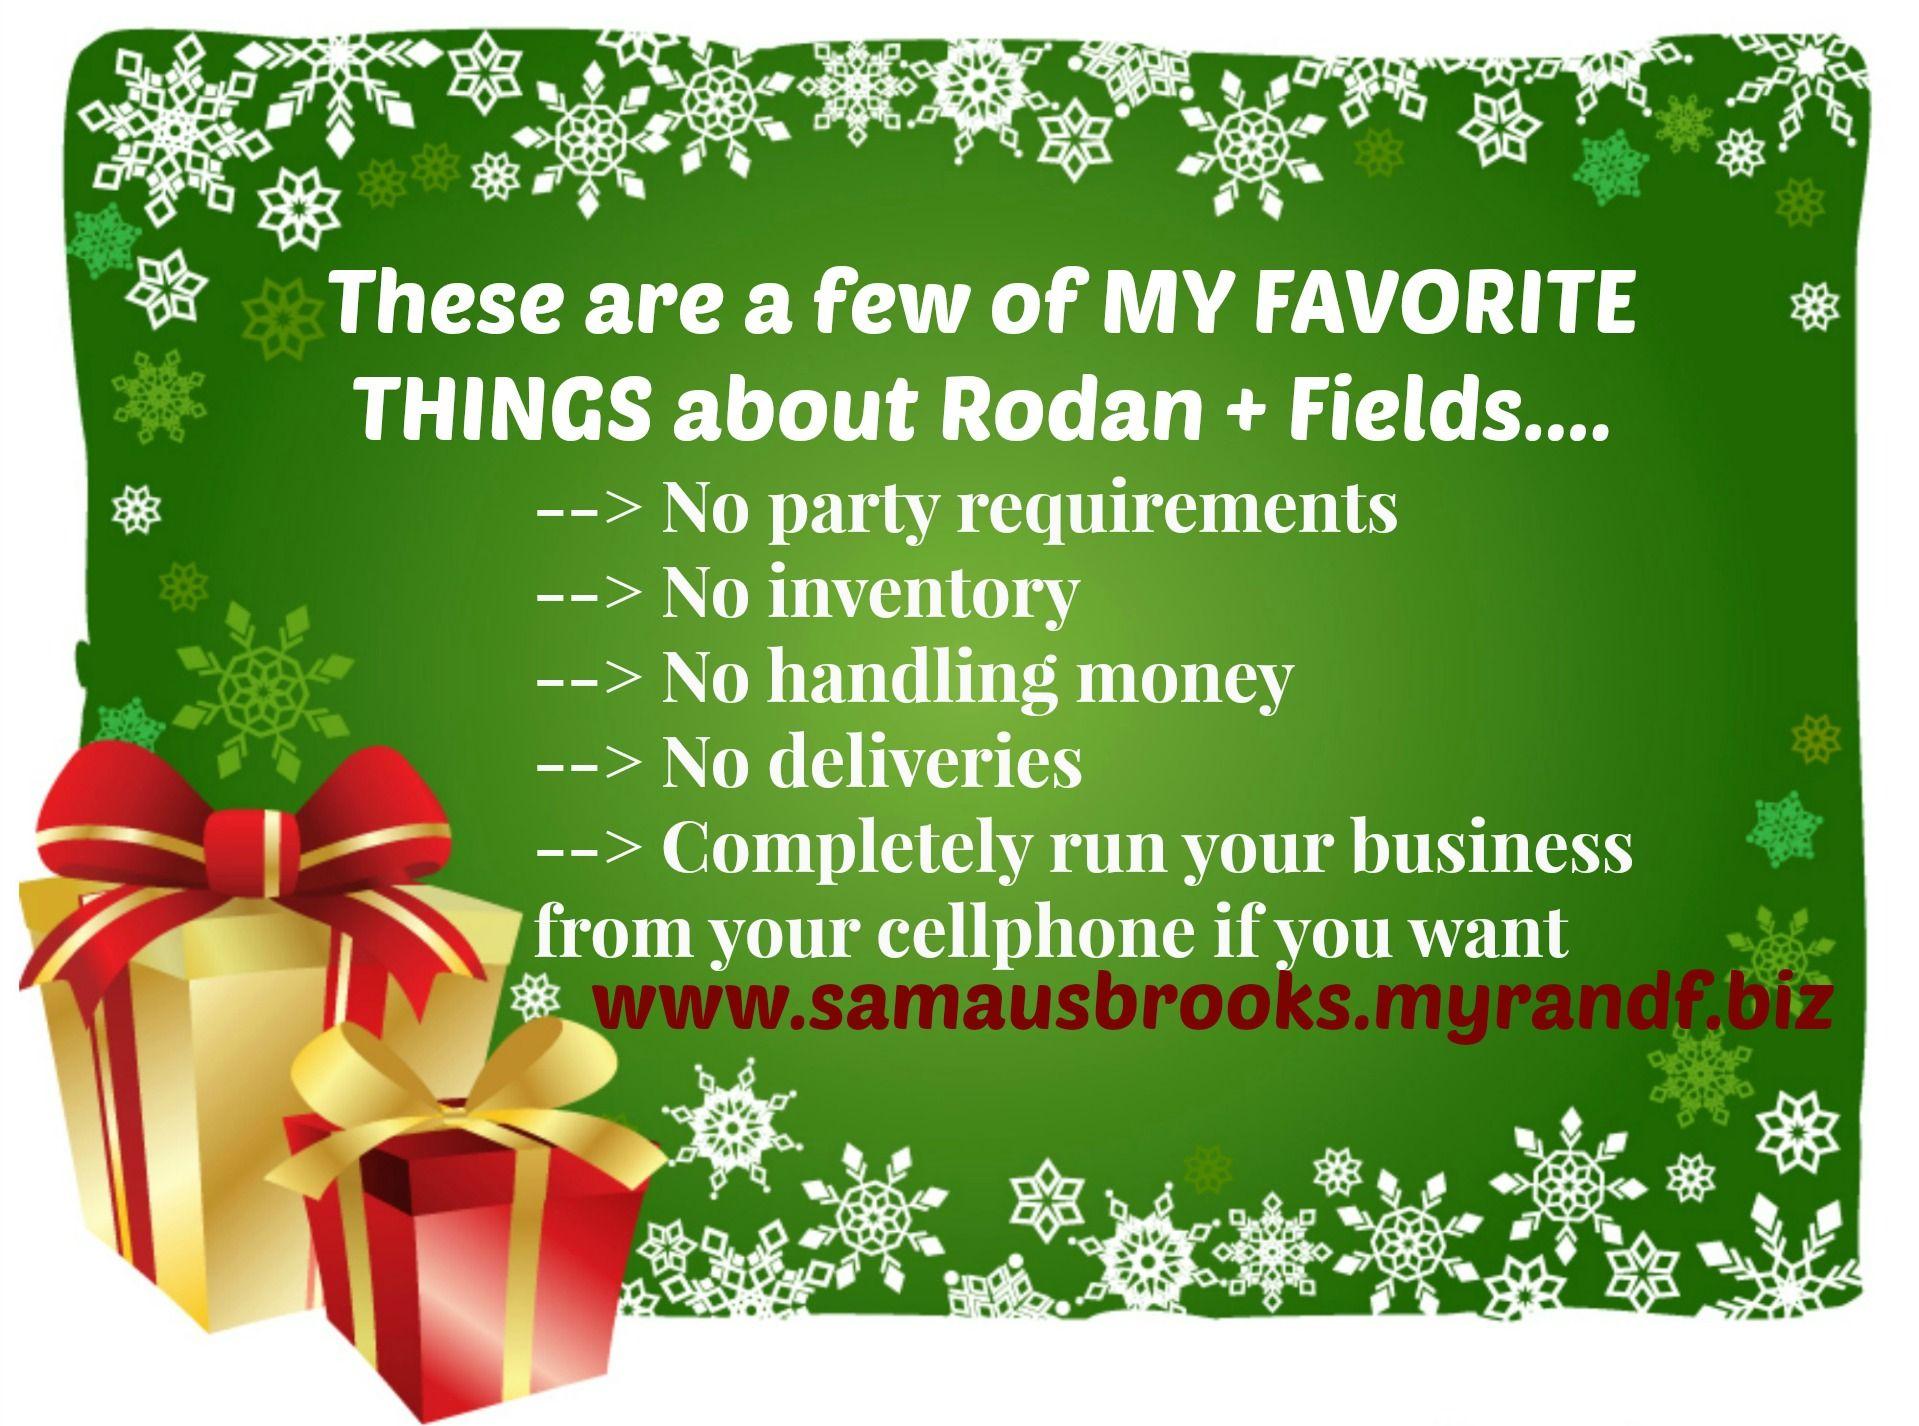 Just a FEW OF MY FAVORITE THINGS!!  #favoritethings #workfromhome #holiday #gift #bestjobever